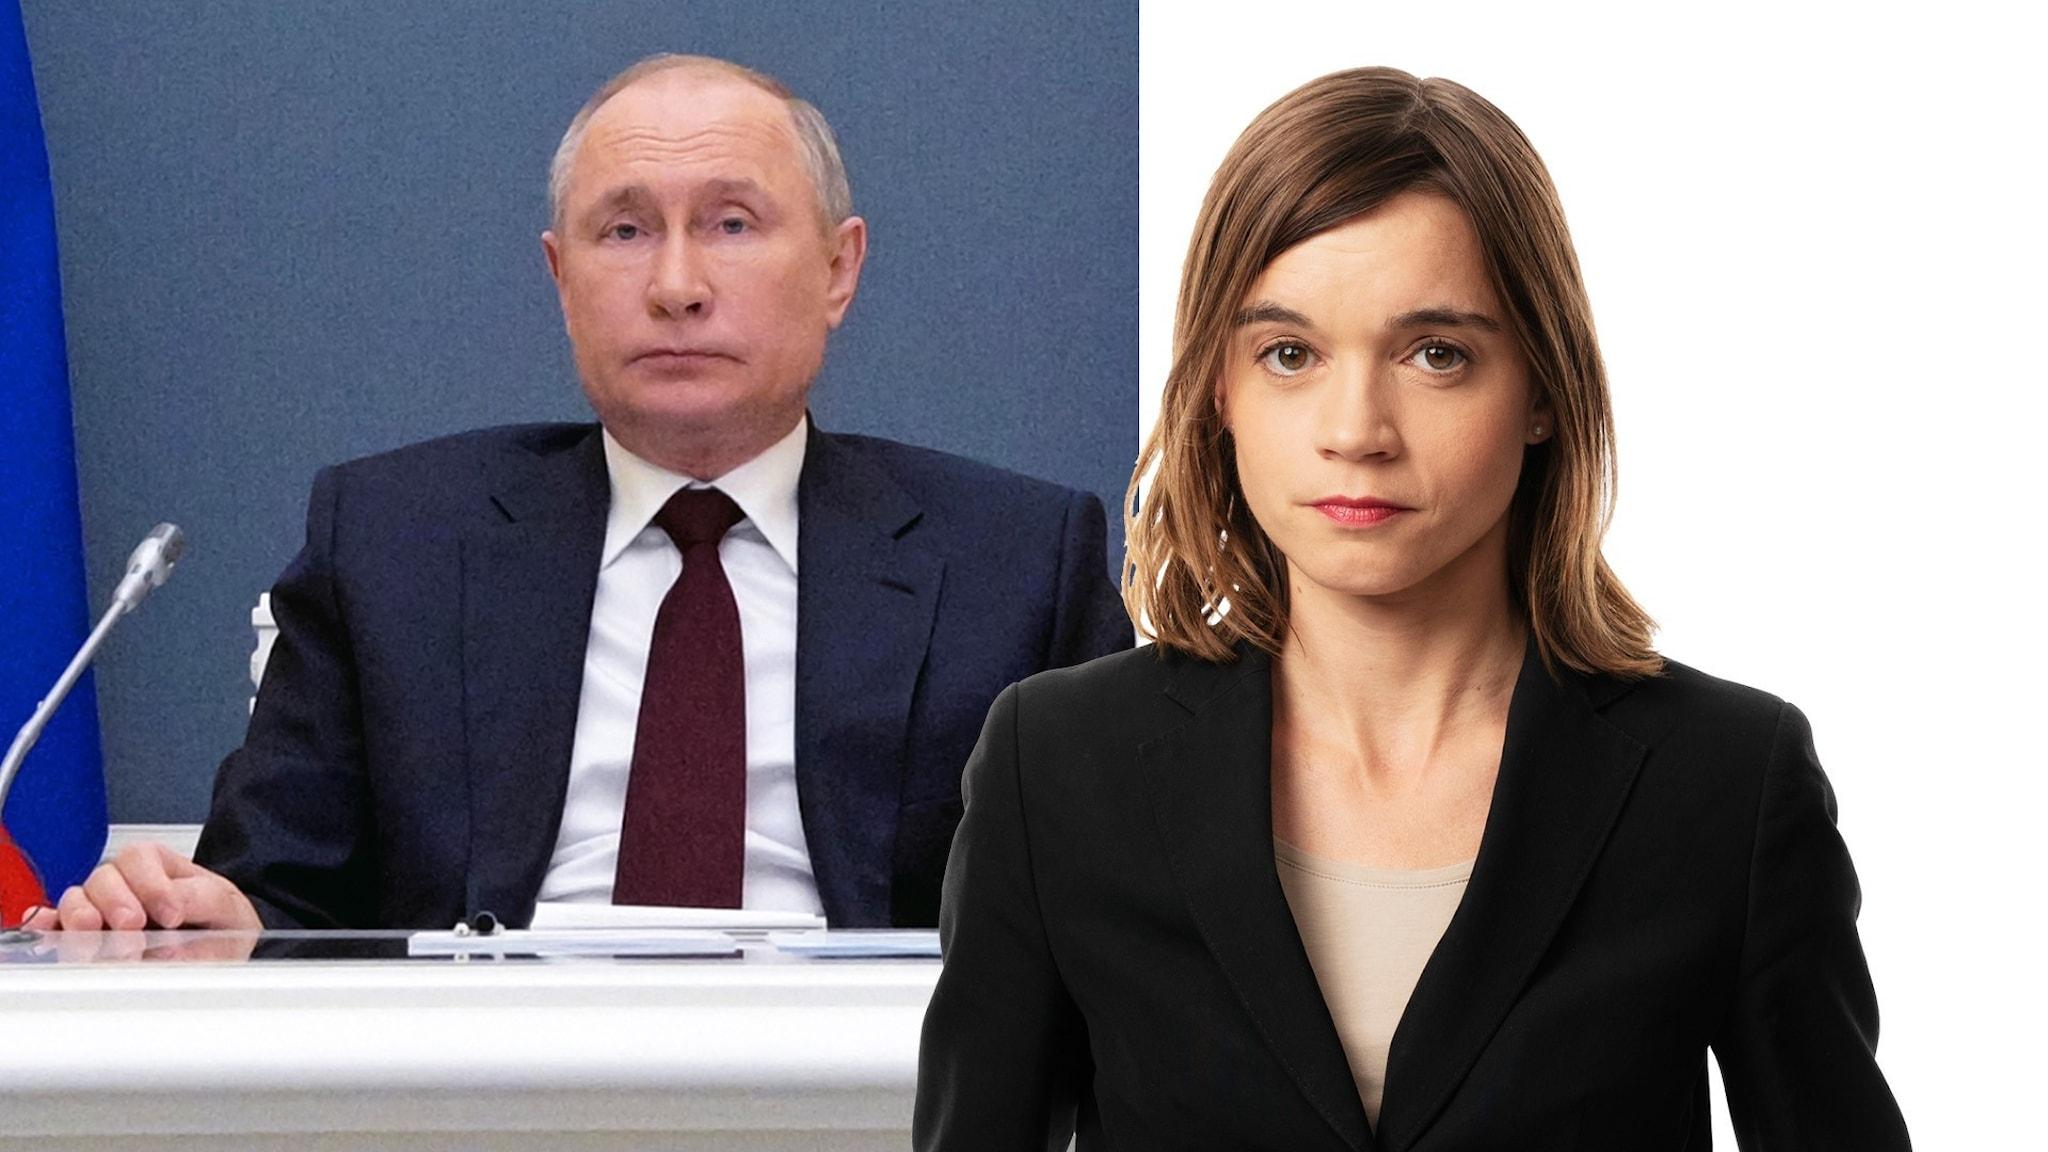 Rysslands president Vladimir Putin/Johanna Melén.